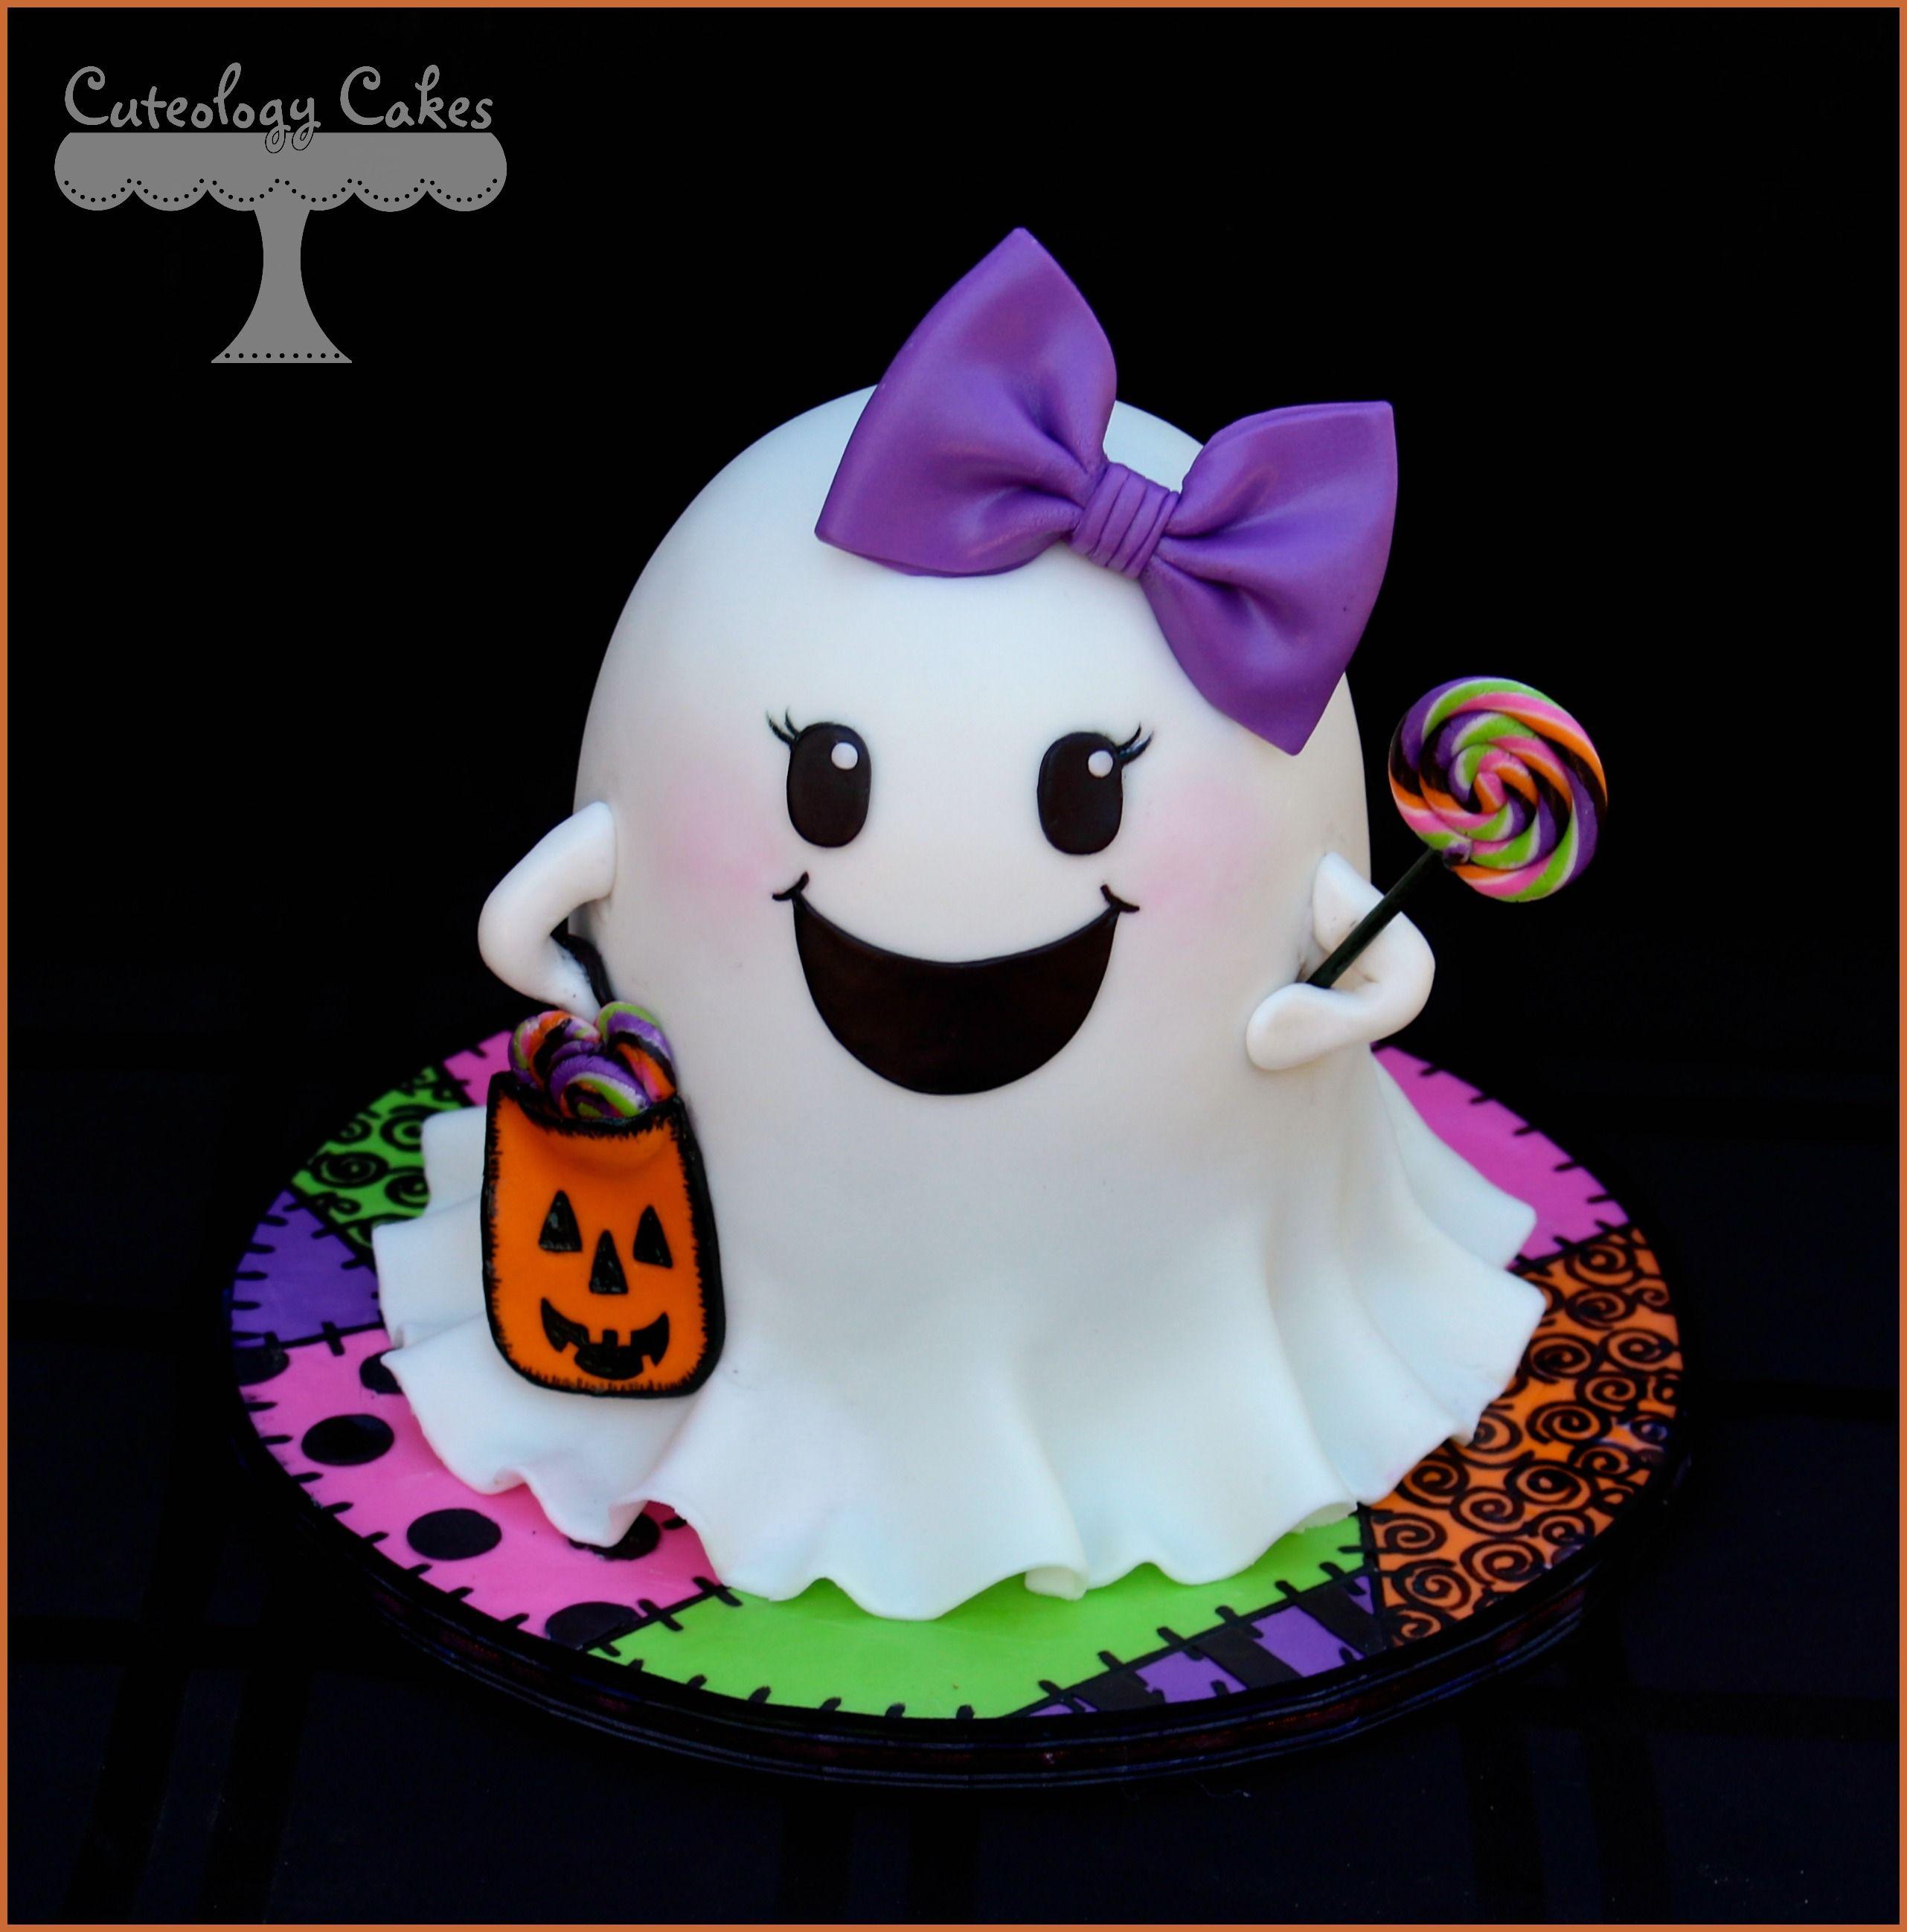 Girly Ghost cake for Halloween wwwfacebookcomilovecuteology